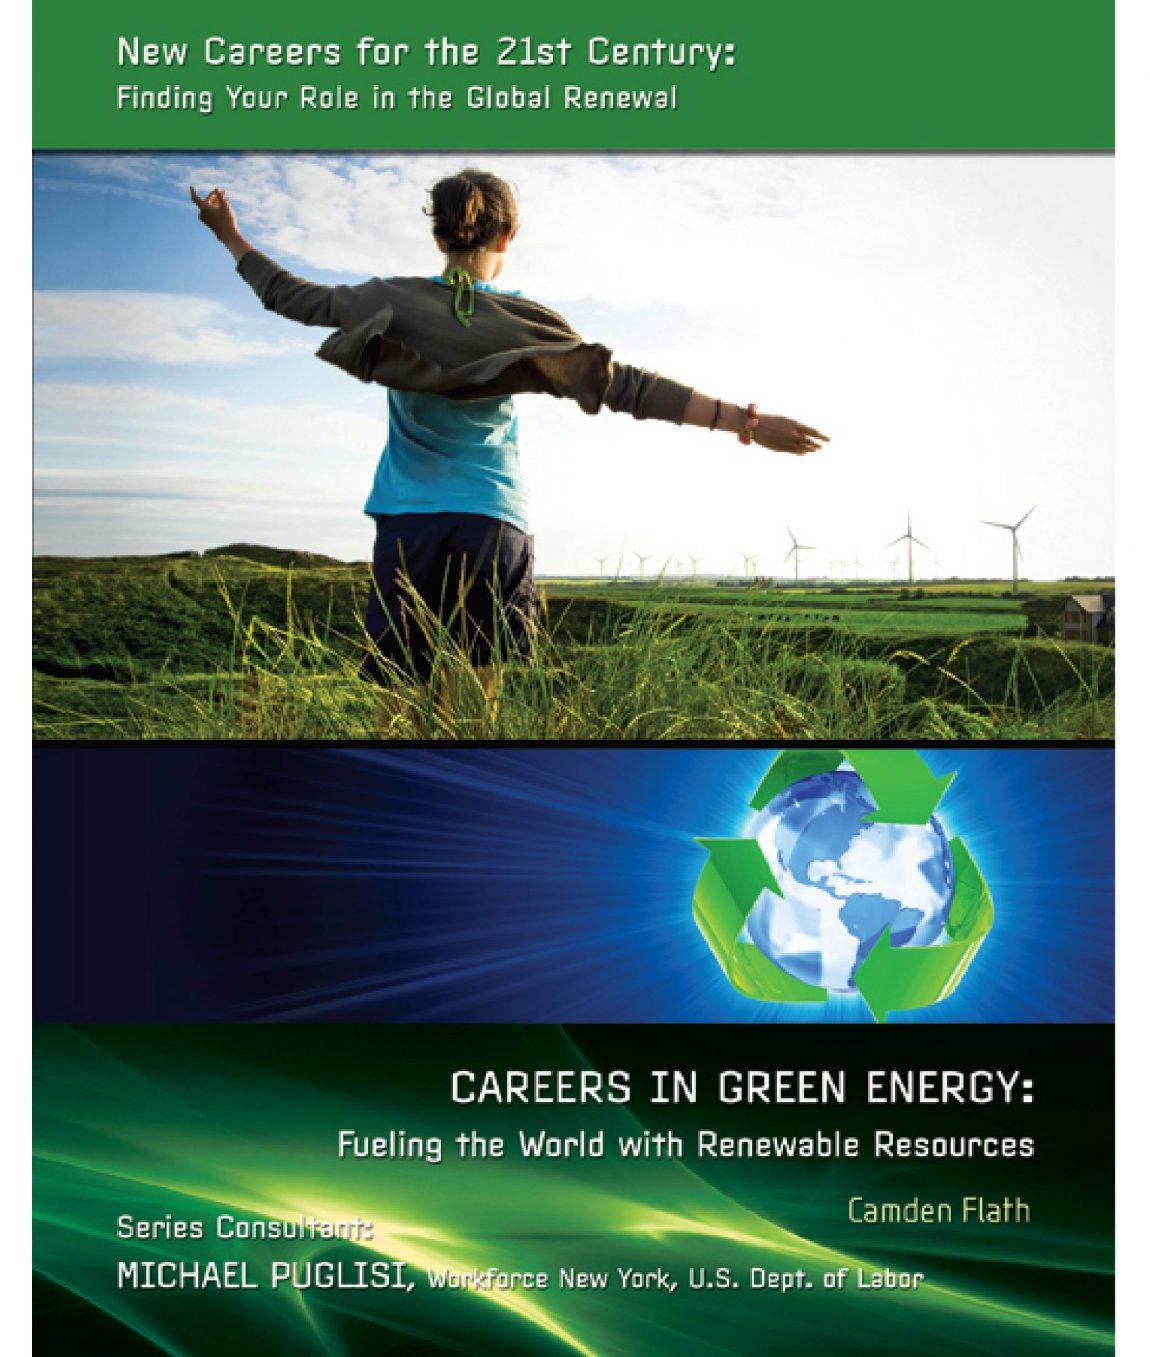 green-energy-01.jpg